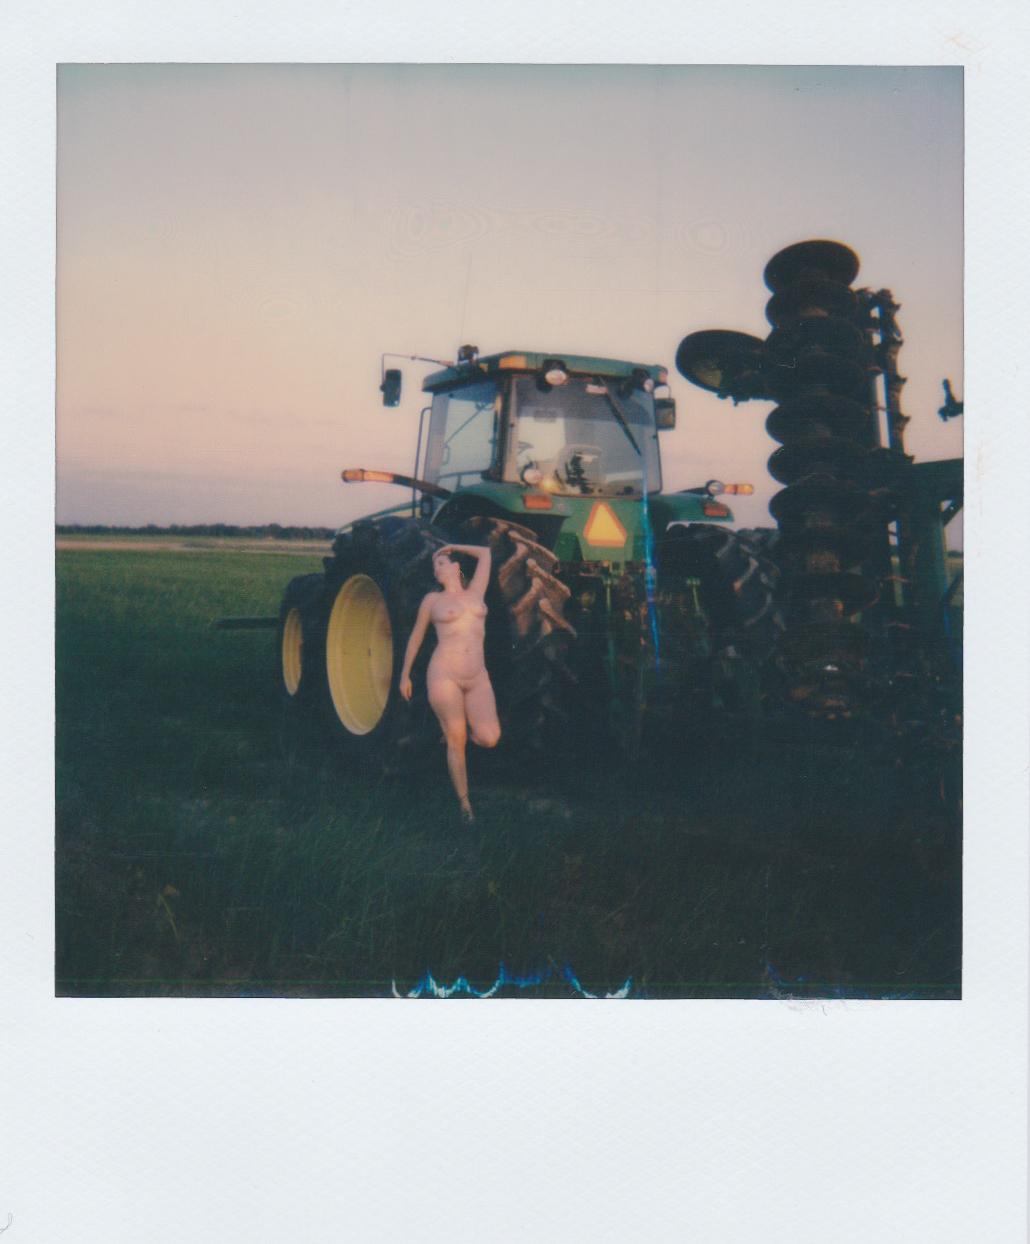 Polaroid project Day 2-4 by JW Purdy